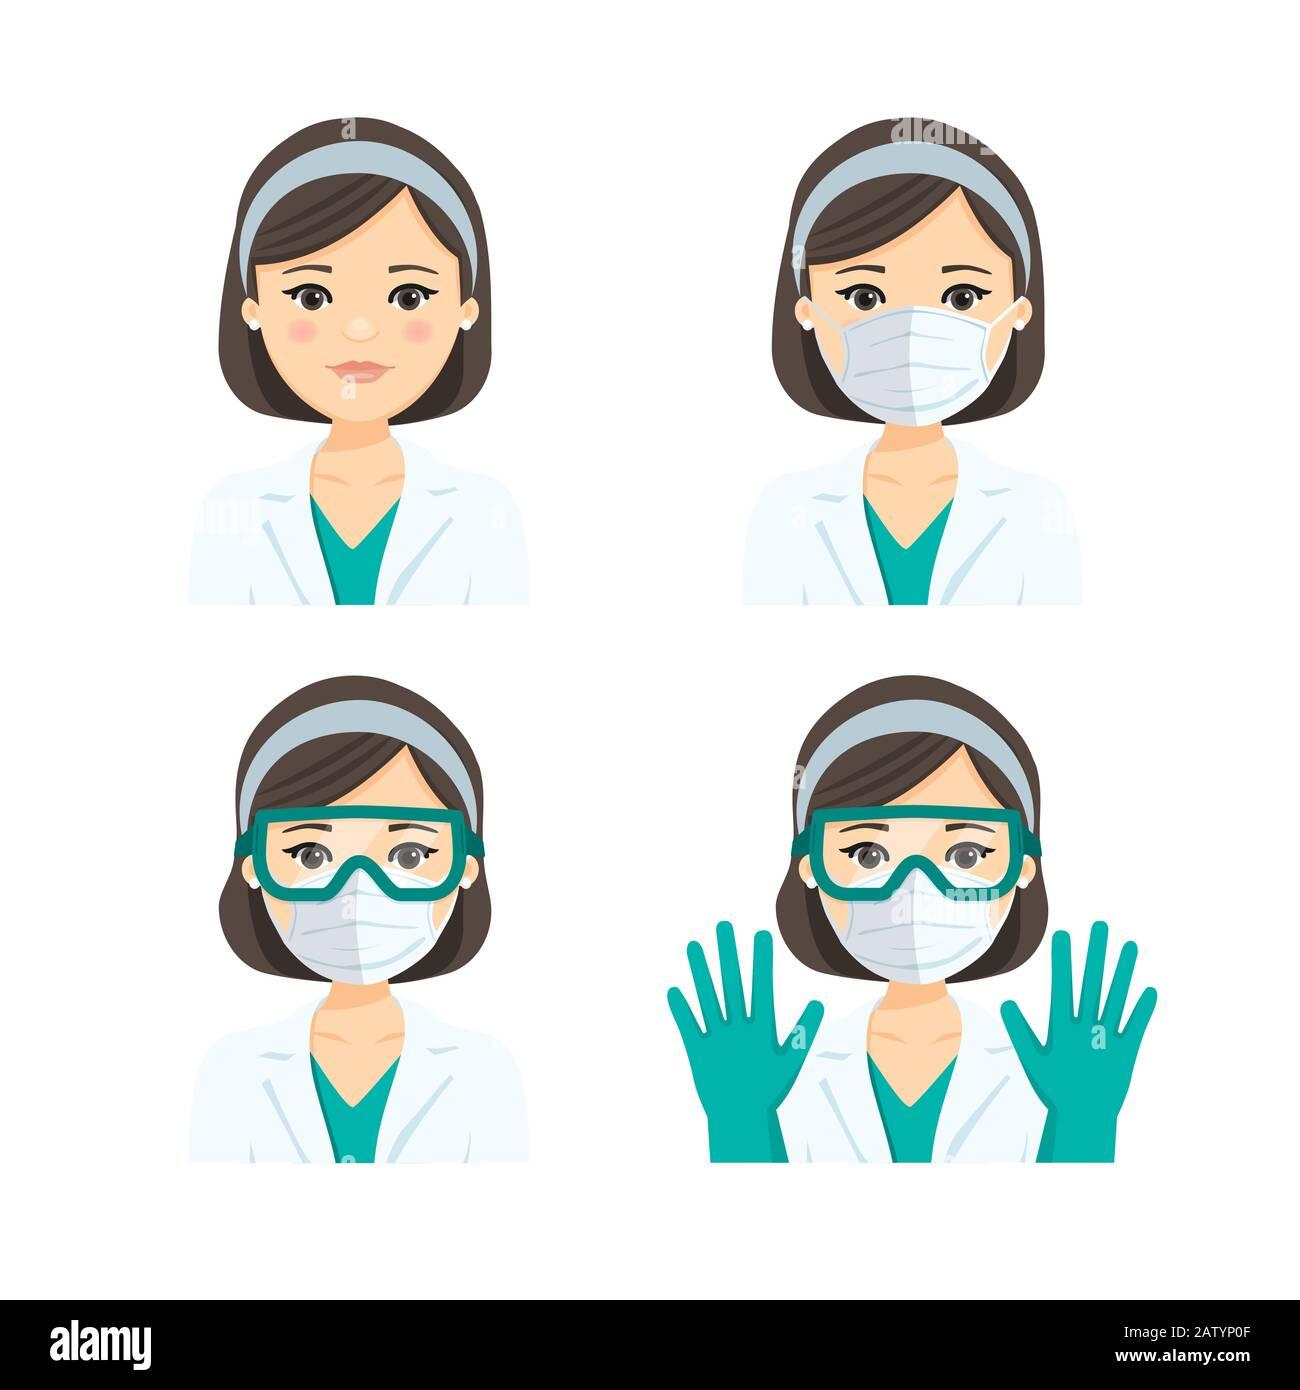 maschera medico n95